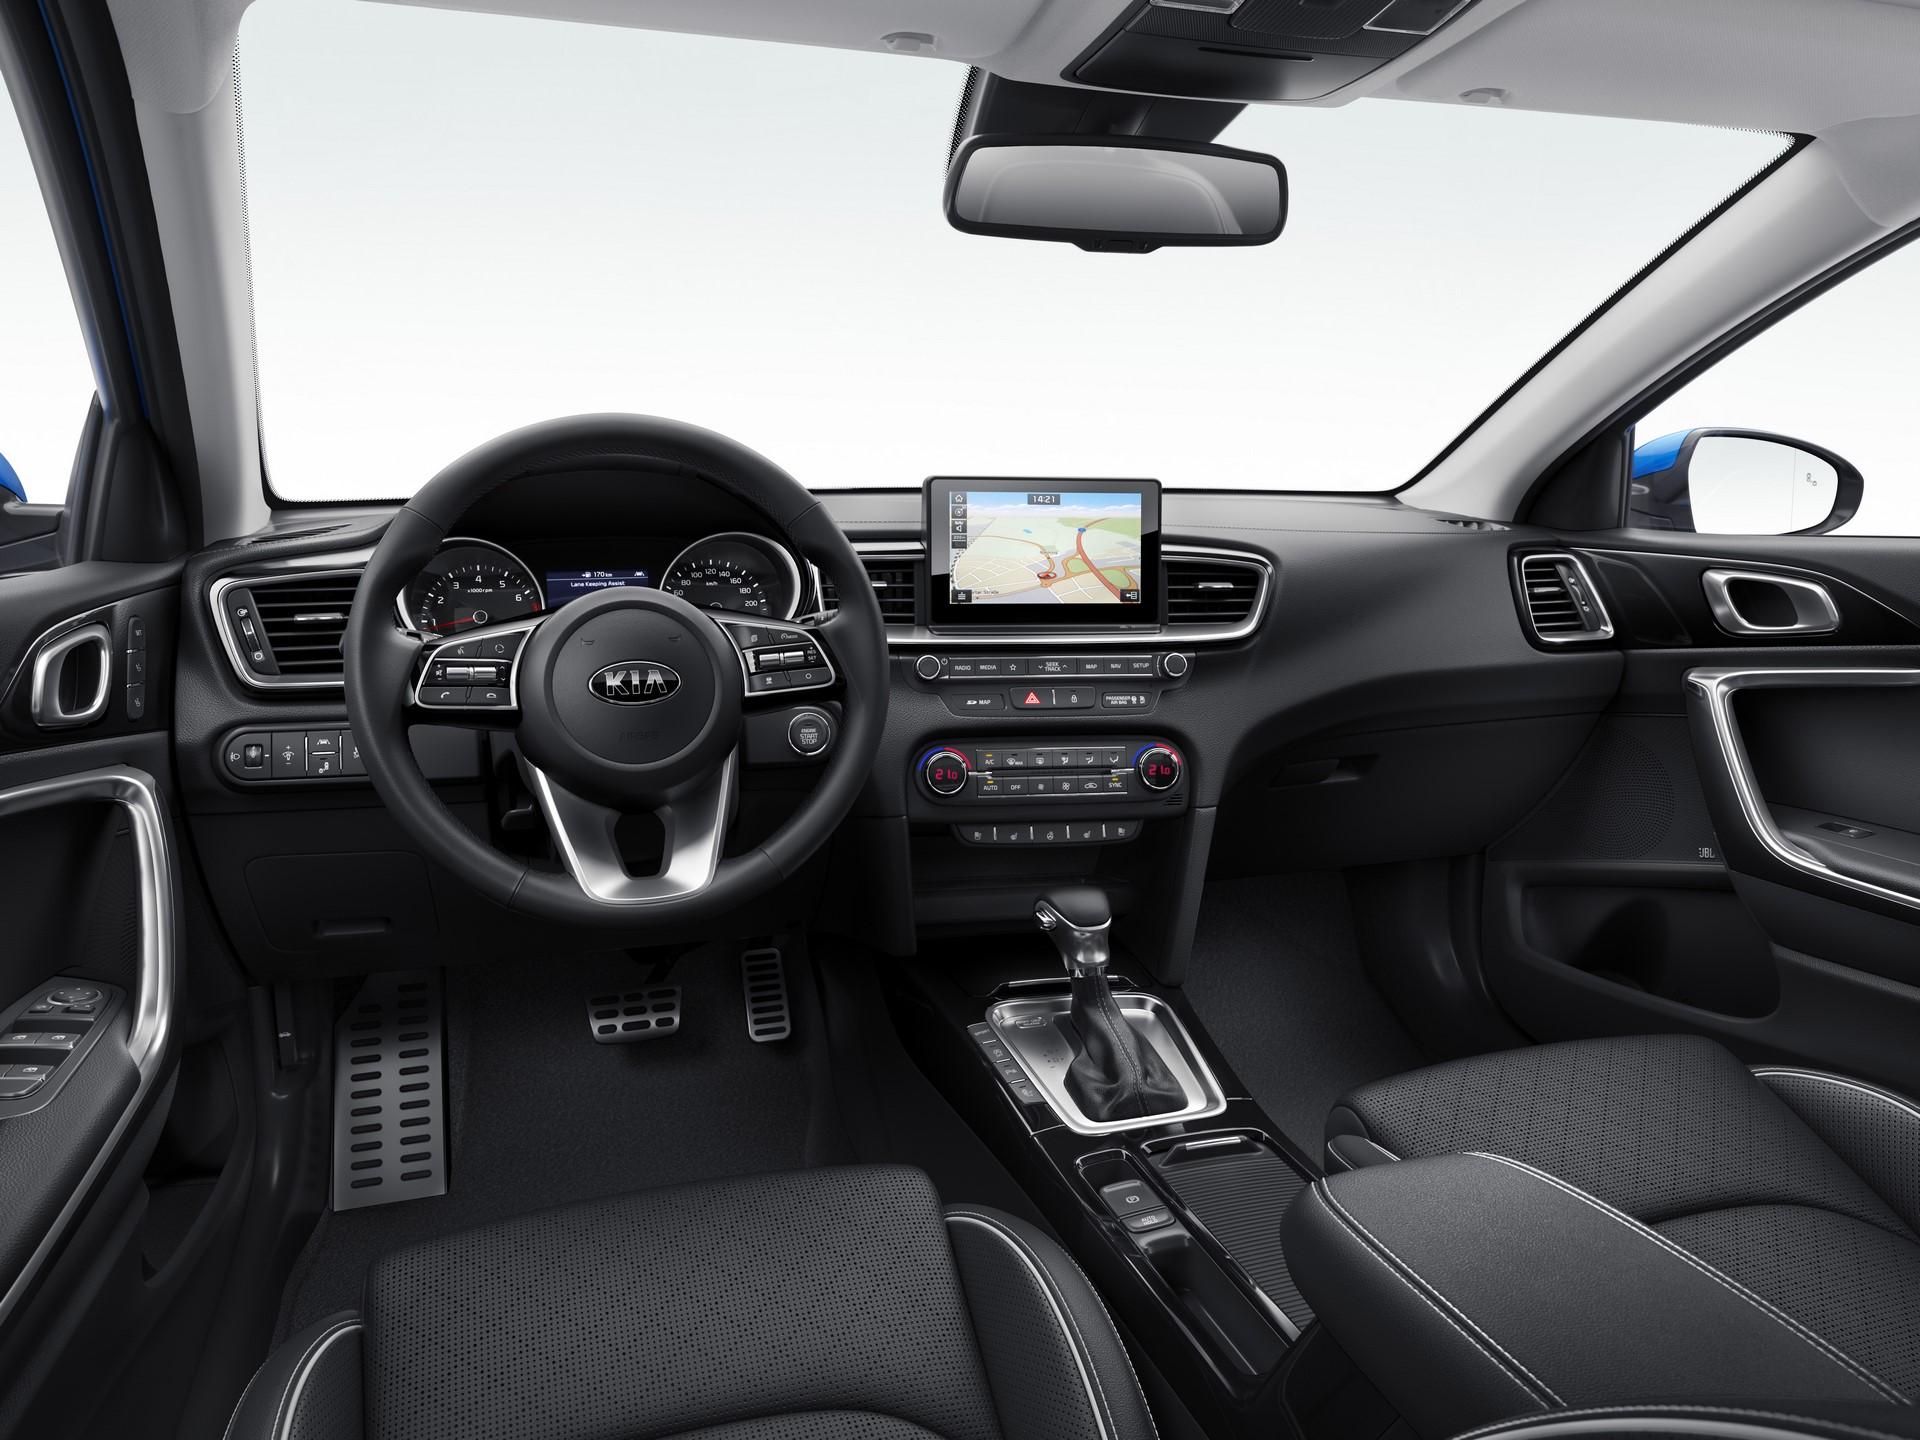 Kia Ceed 2018 (115)